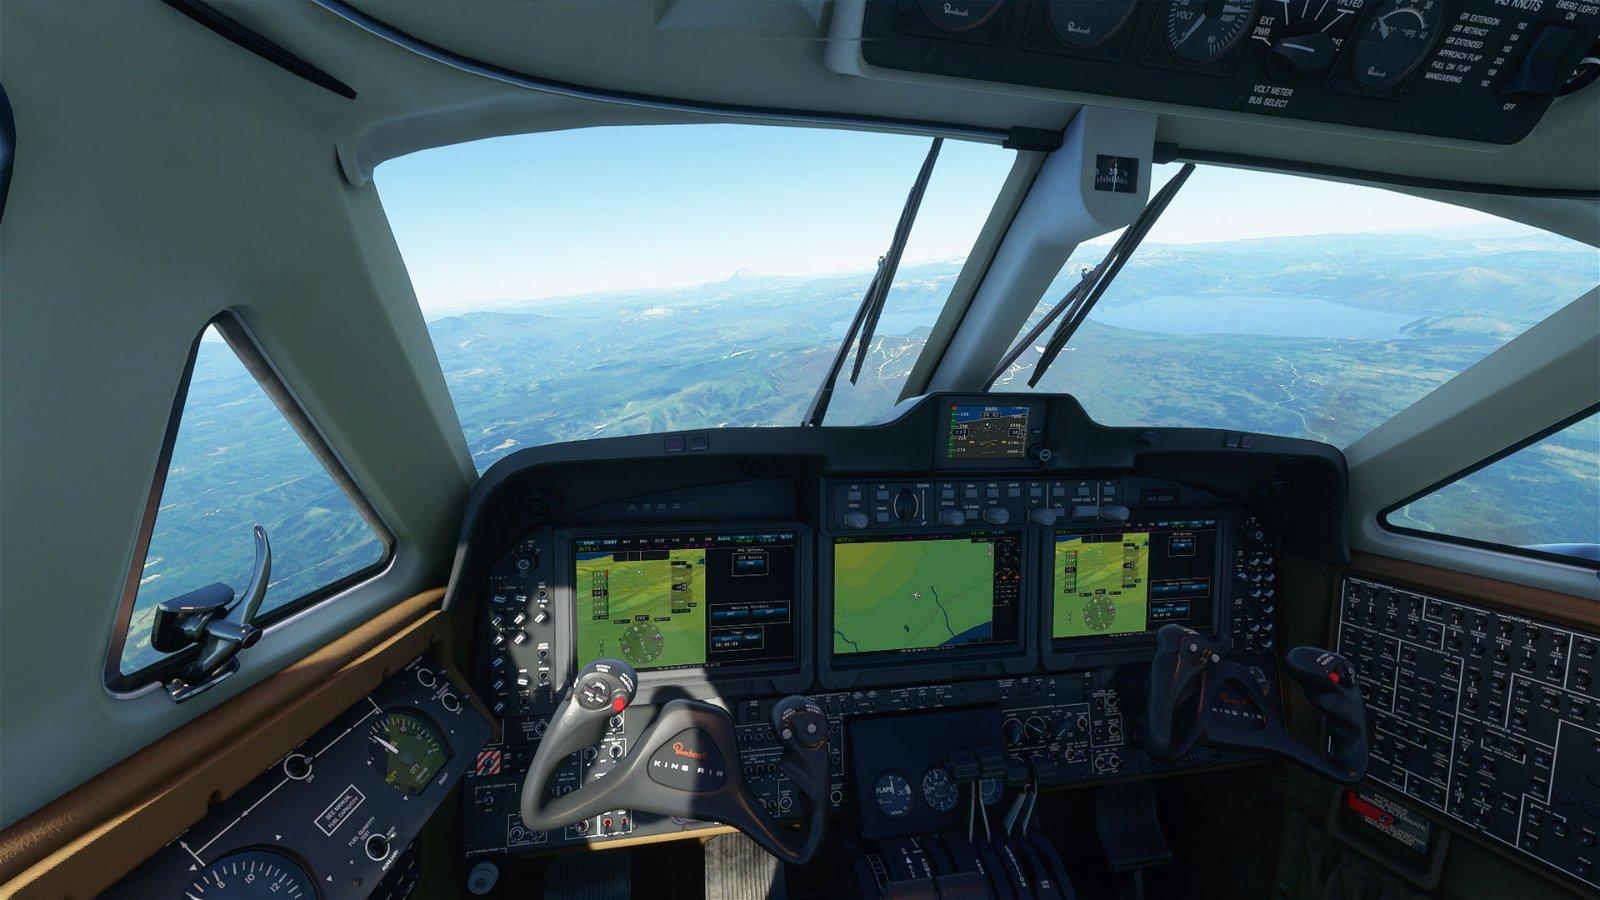 Microsoft Flight Simulator Finally Adds VR Support